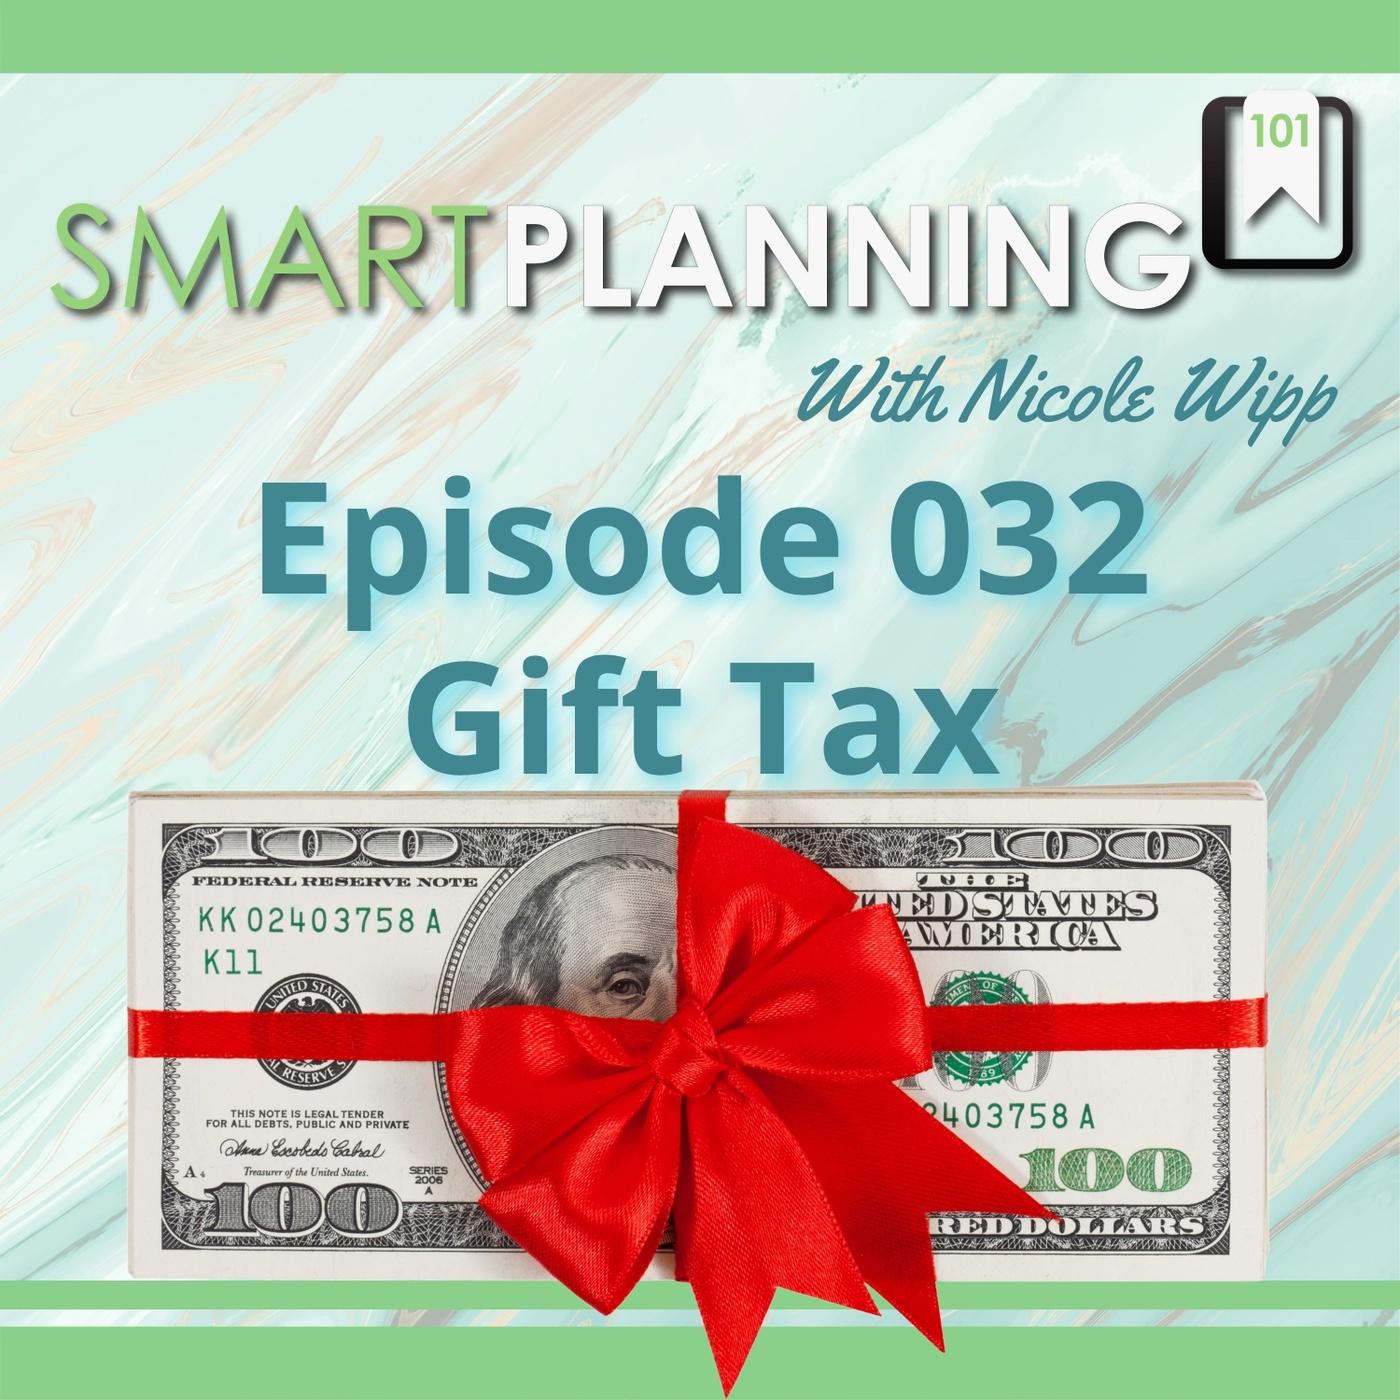 Io5iw1nhrtyb4yqqfmmw smart planning 101 podcast with nicole wipp episode 032 gift tax